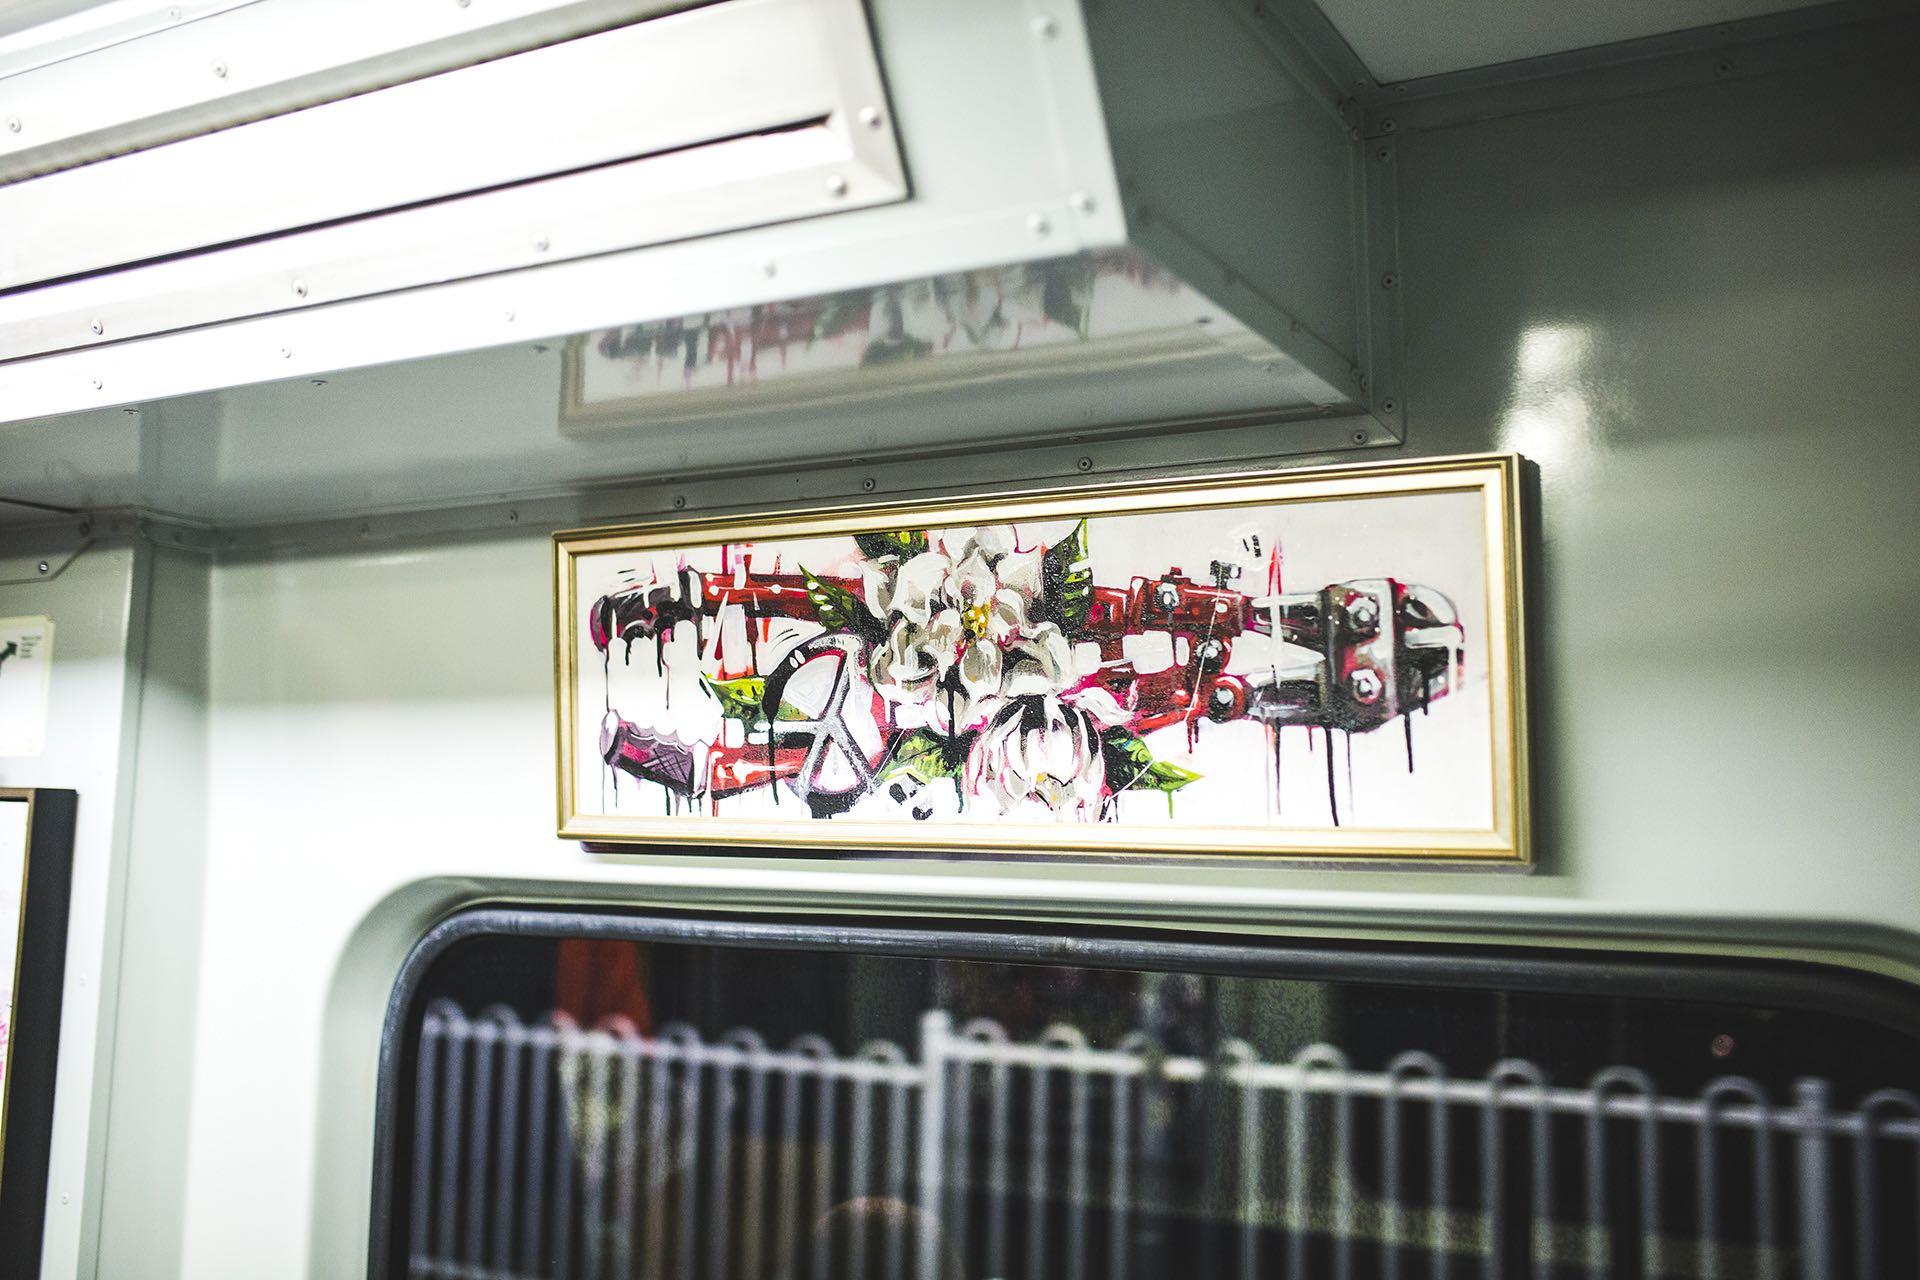 Australia_Graffiti_Scott_Marsh30.jpeg